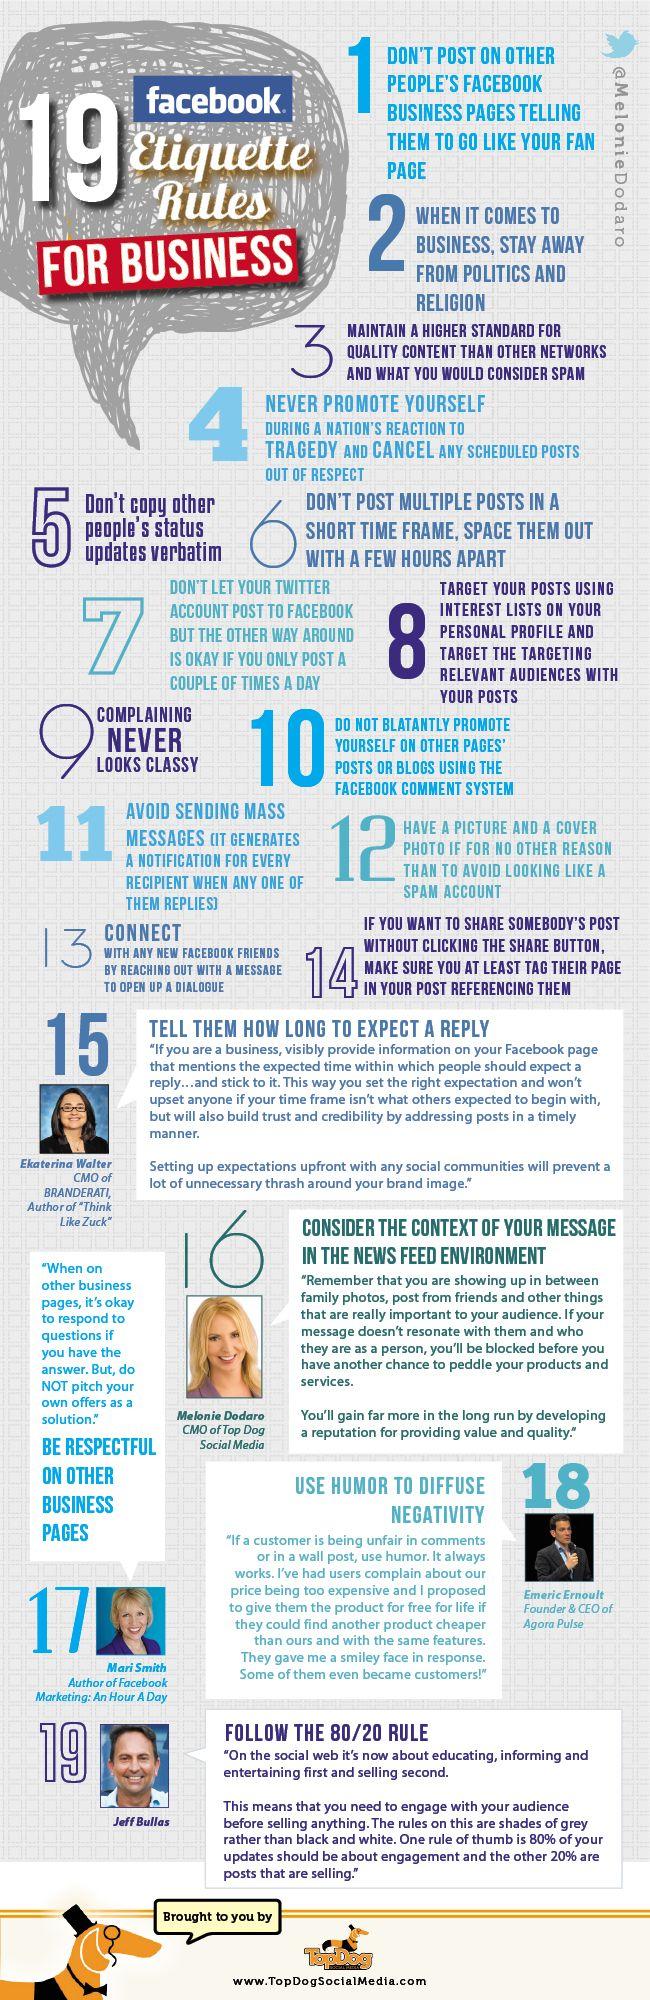 19 Facebook Etiquette Rules for Business [@Lisa Phillips-Barton. Simms Furuya Dodaro - TopDogSocialMedia]